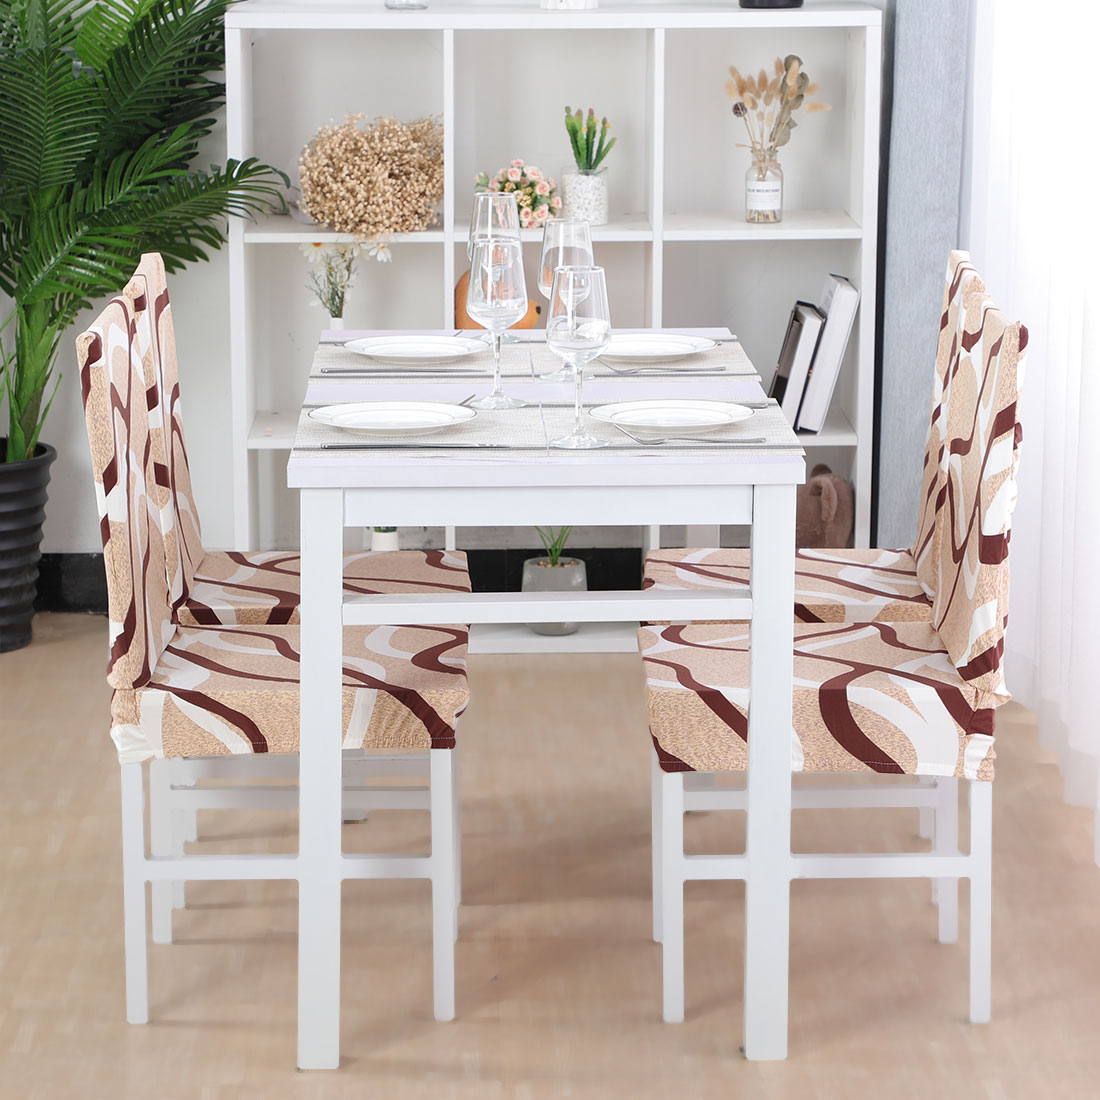 Elastic Short Chair Covers For Kitchen Dining Room Set Of 4 Walmart Com Walmart Com